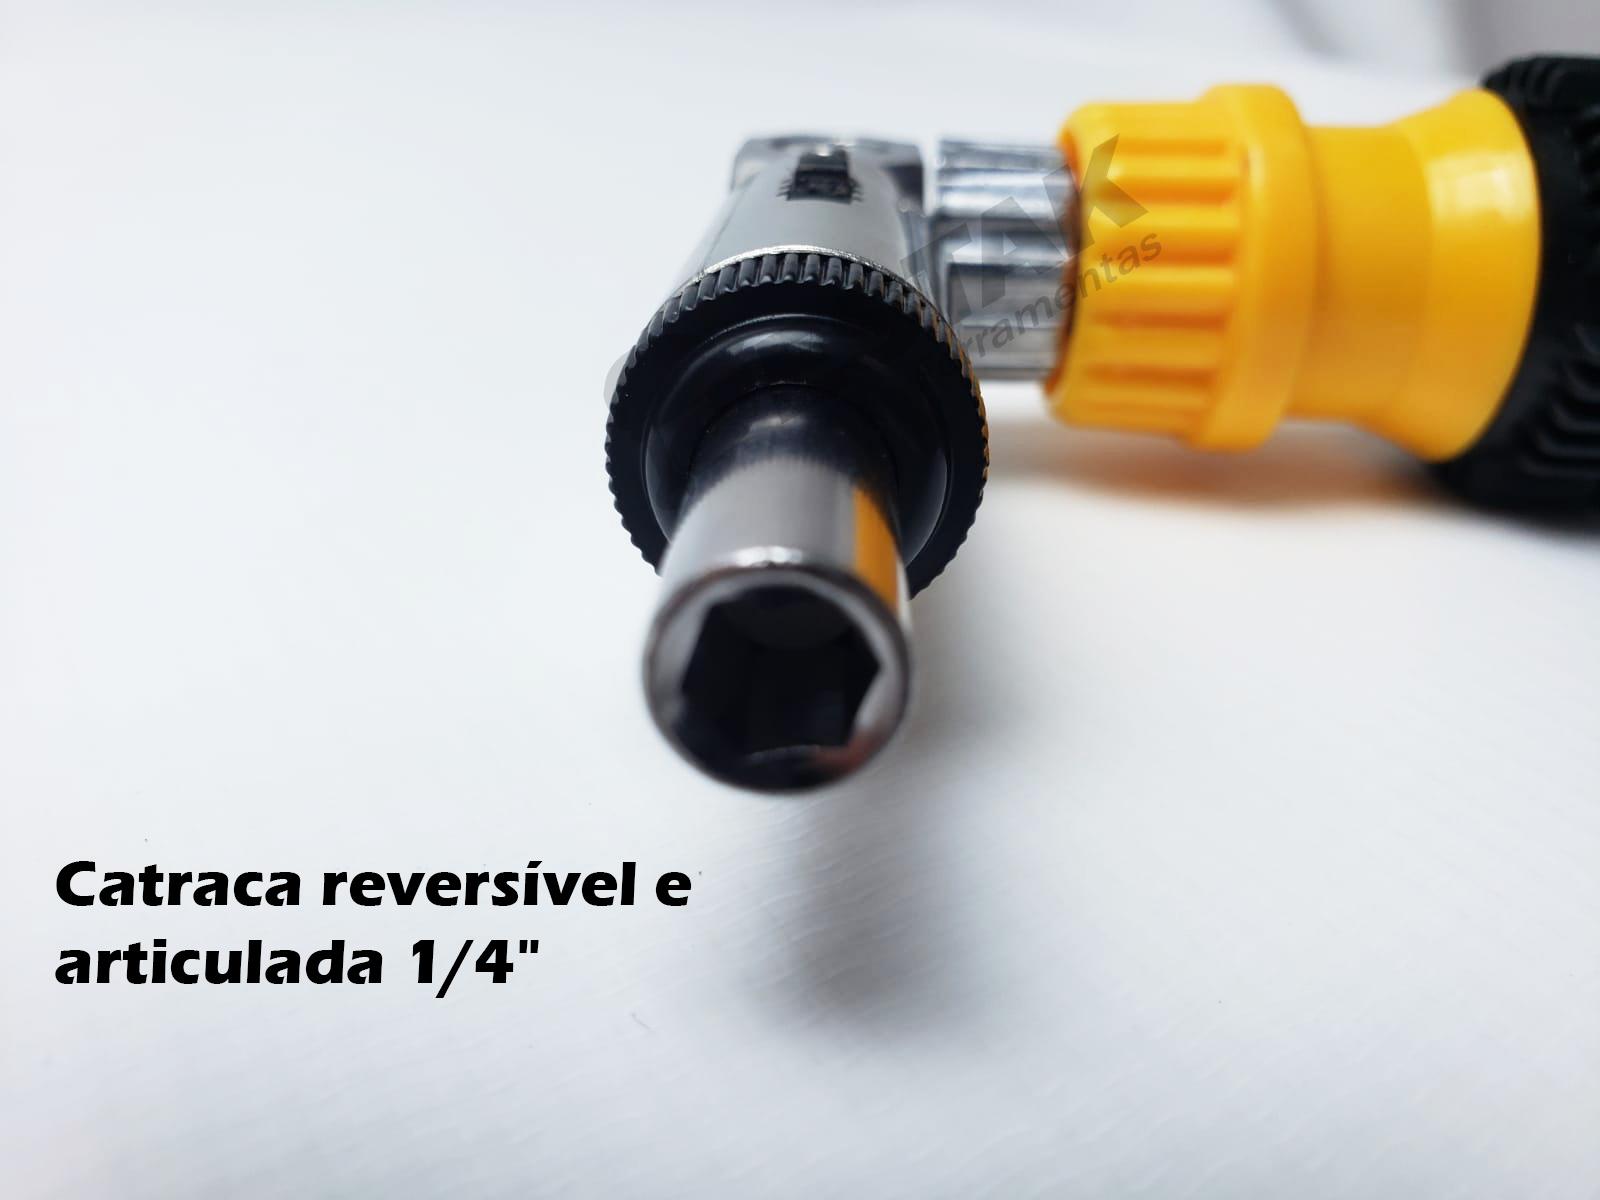 Kit Furadeira Impacto 750w 127V 1/2 Mandril + Kit 83 Ferramentas